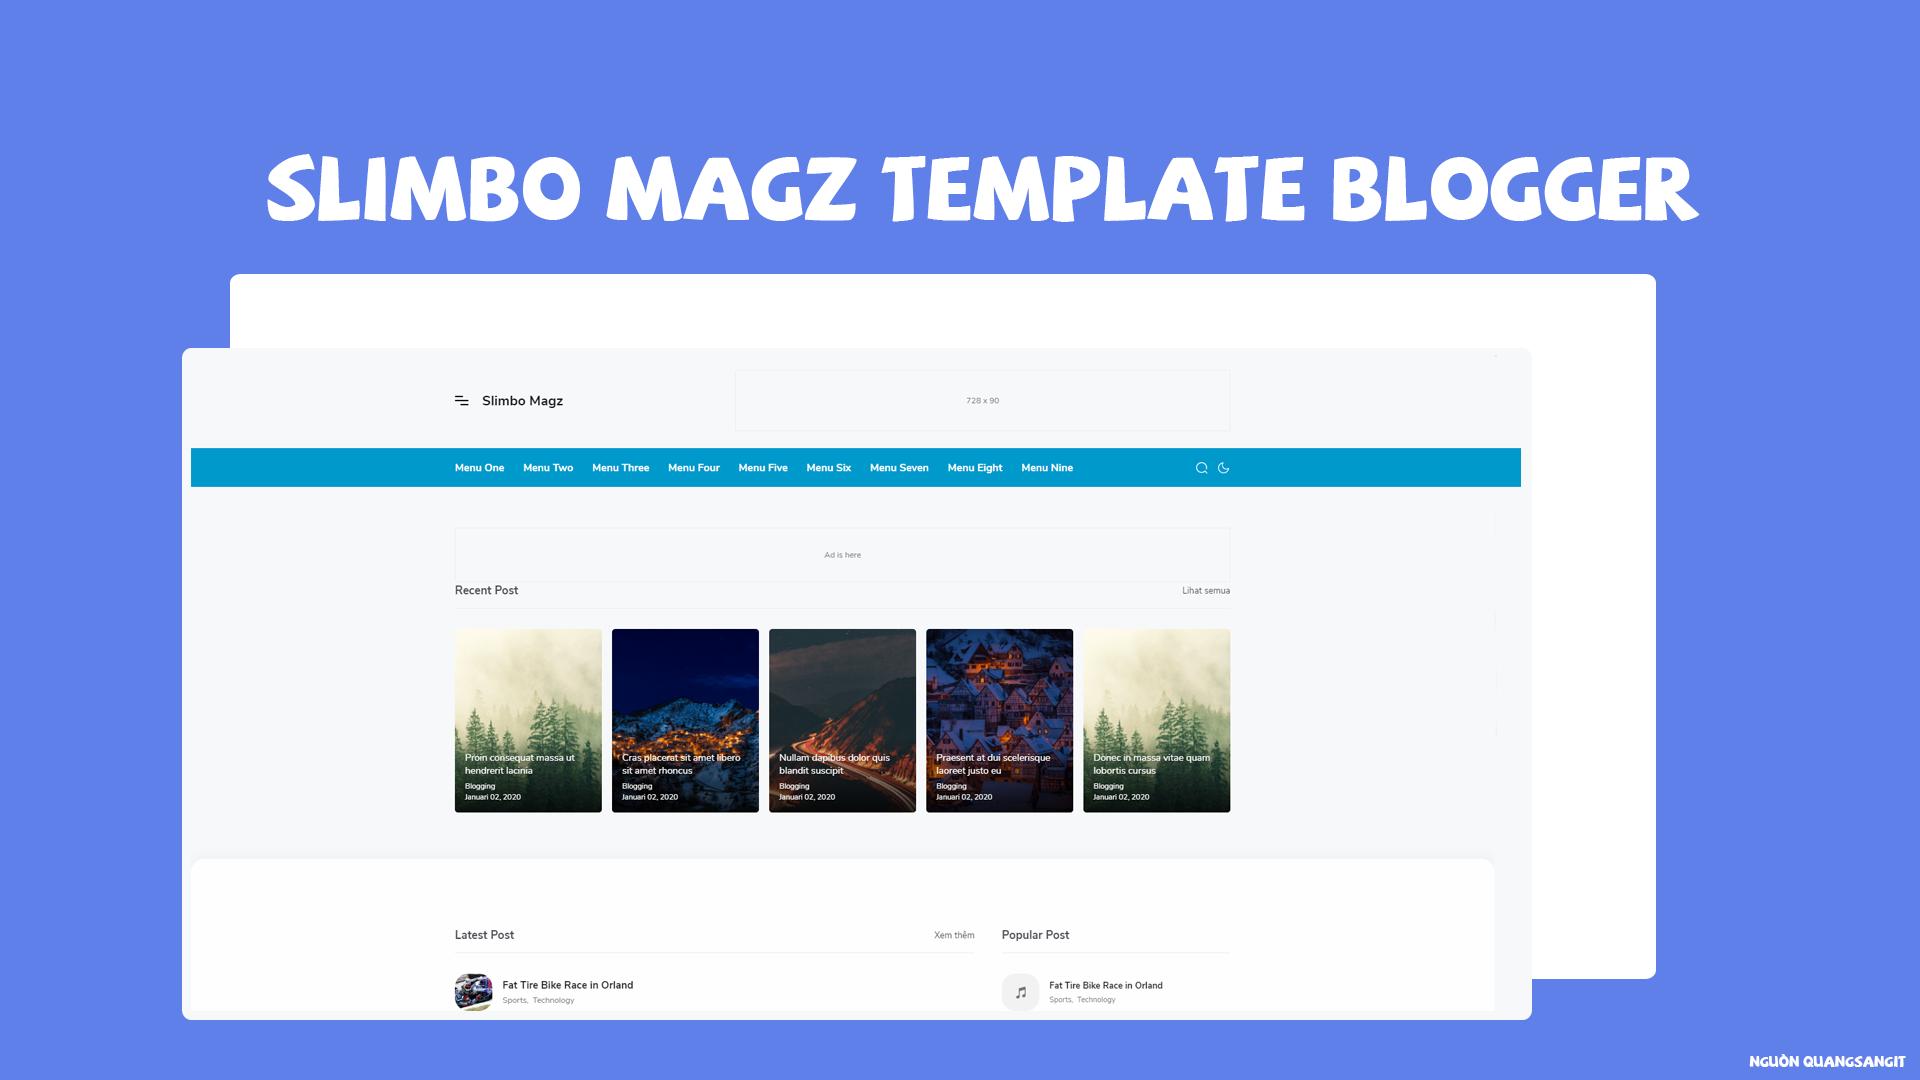 Slimbo Magz Template Blogger